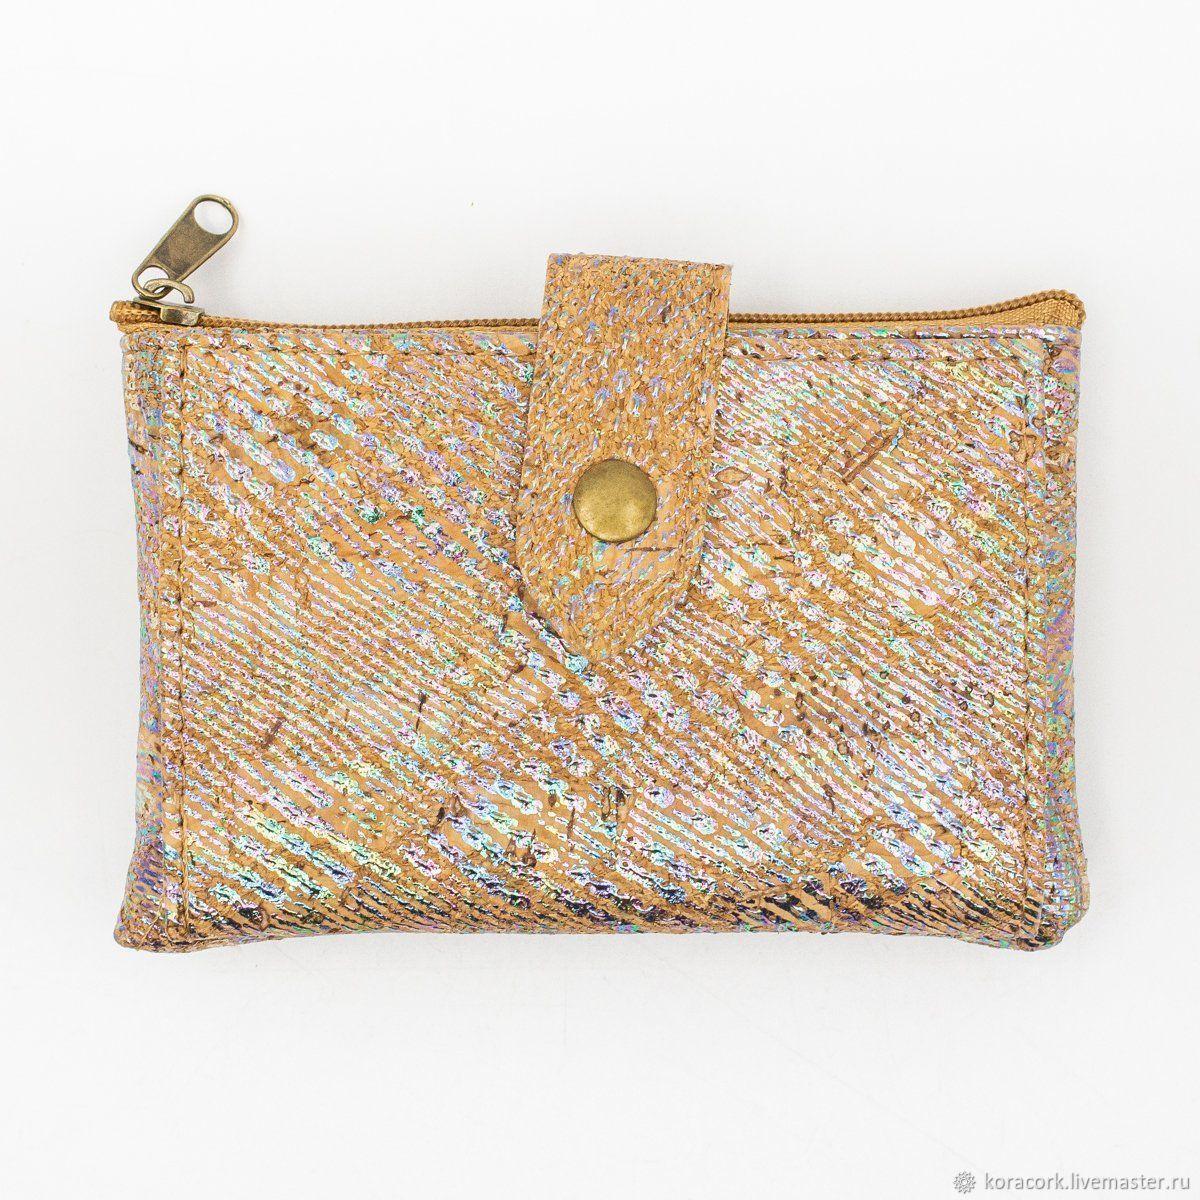 Bags & Accessories handmade. Livemaster - handmade. Buy Bright eco wallet female from Portuguese handmade cork.